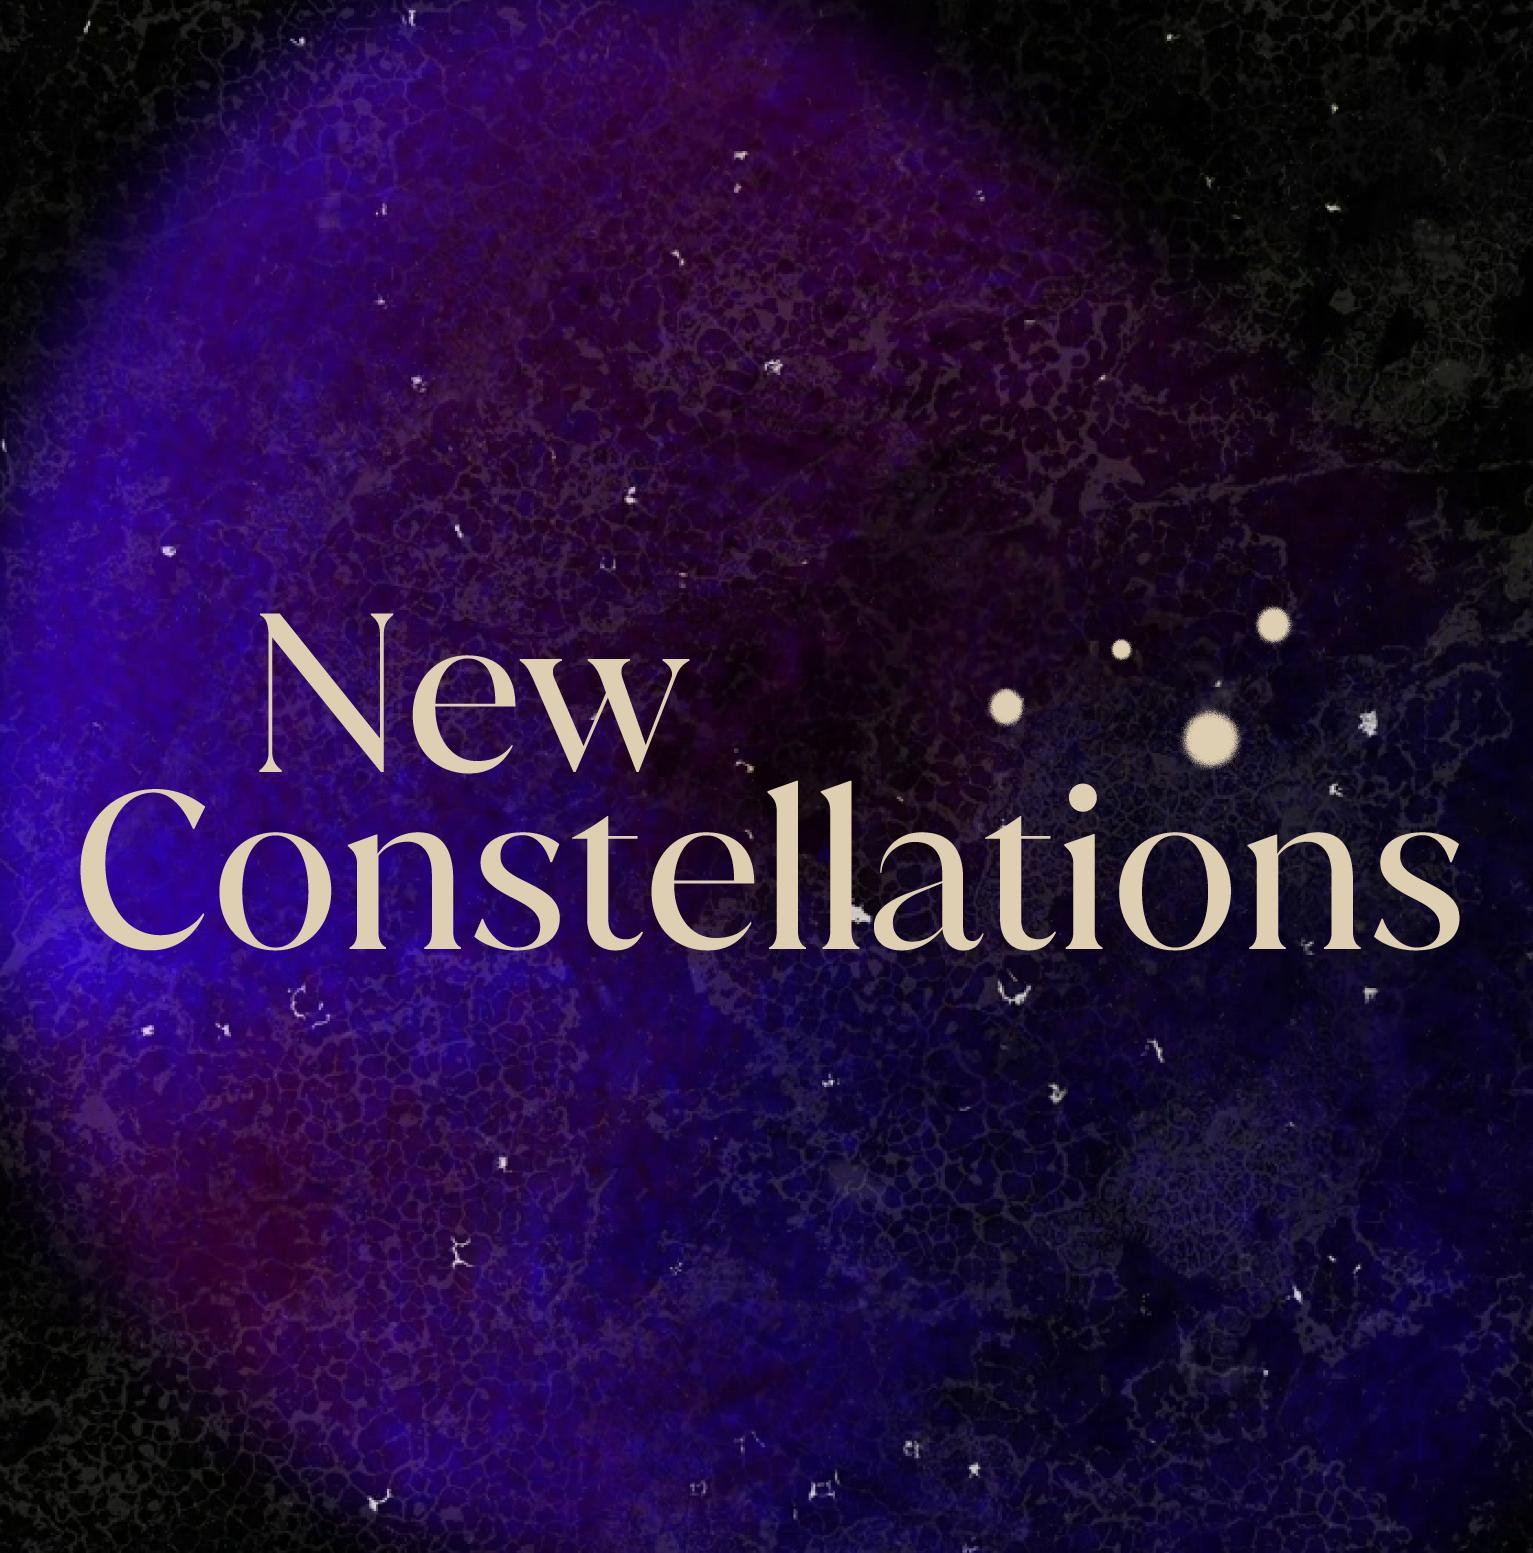 New Constellations